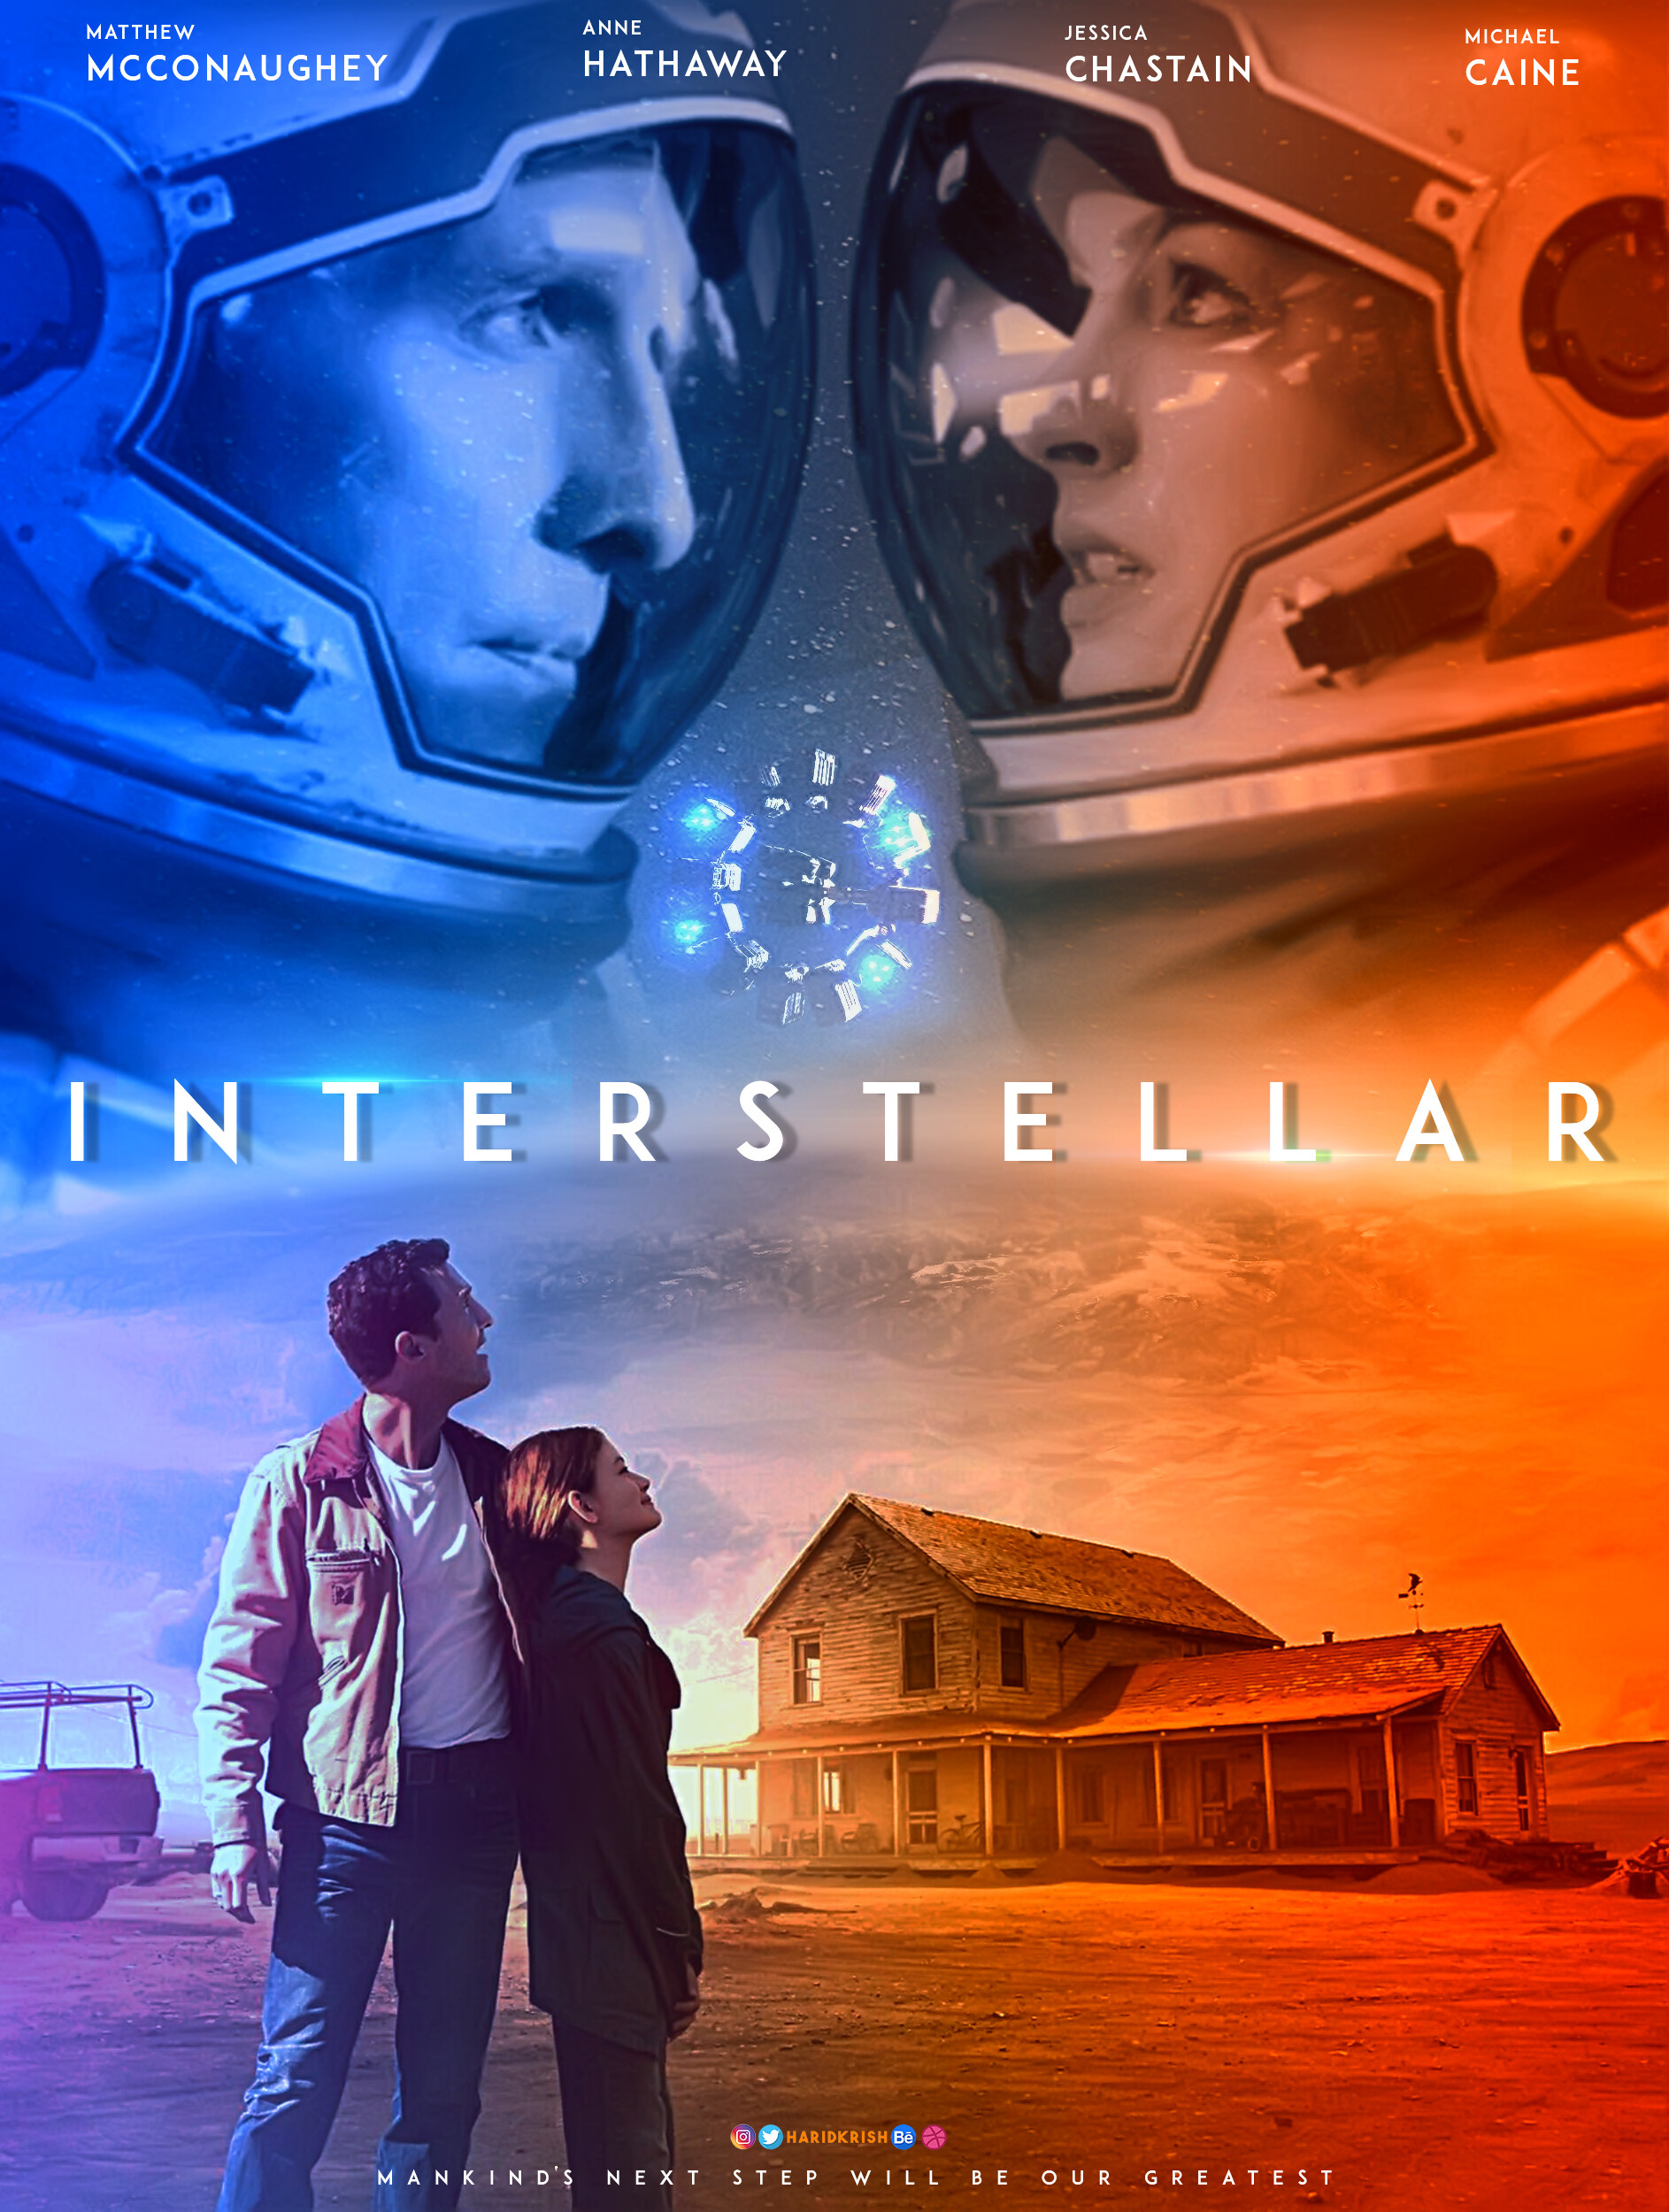 interstellar movie poster design hari